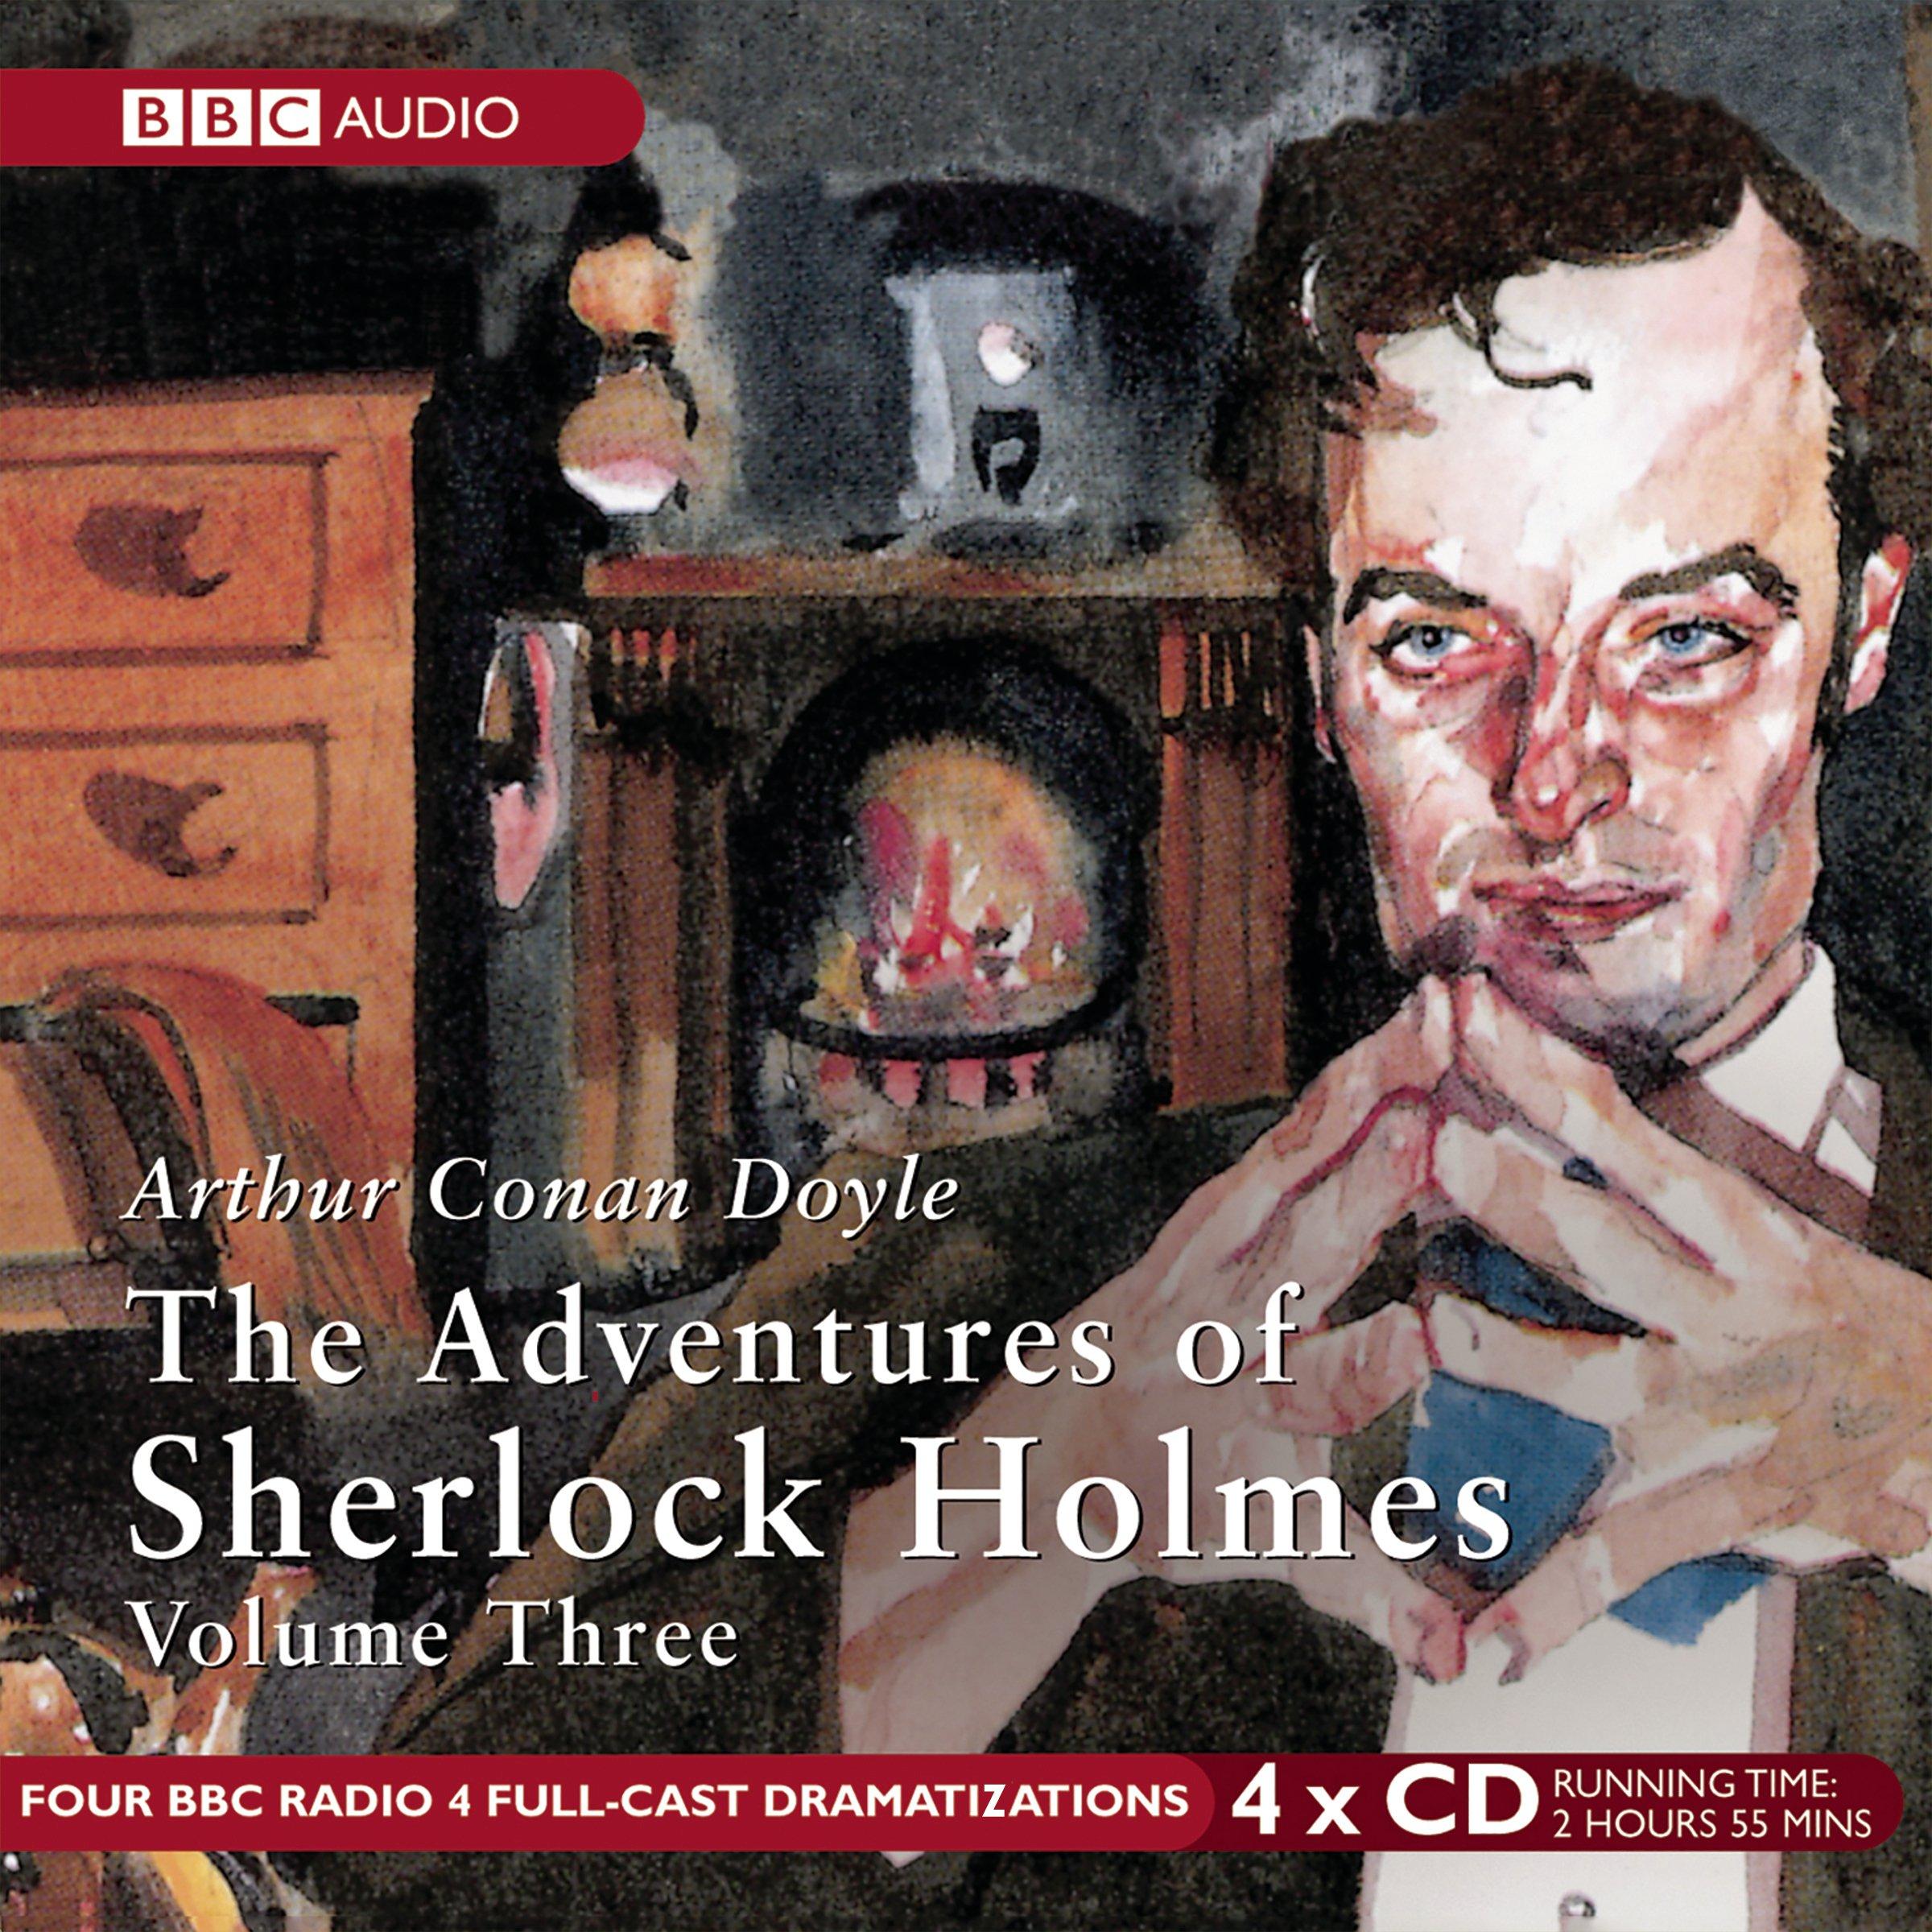 The Adventures of Sherlock Holmes: Volume 3 BBC Radio Full